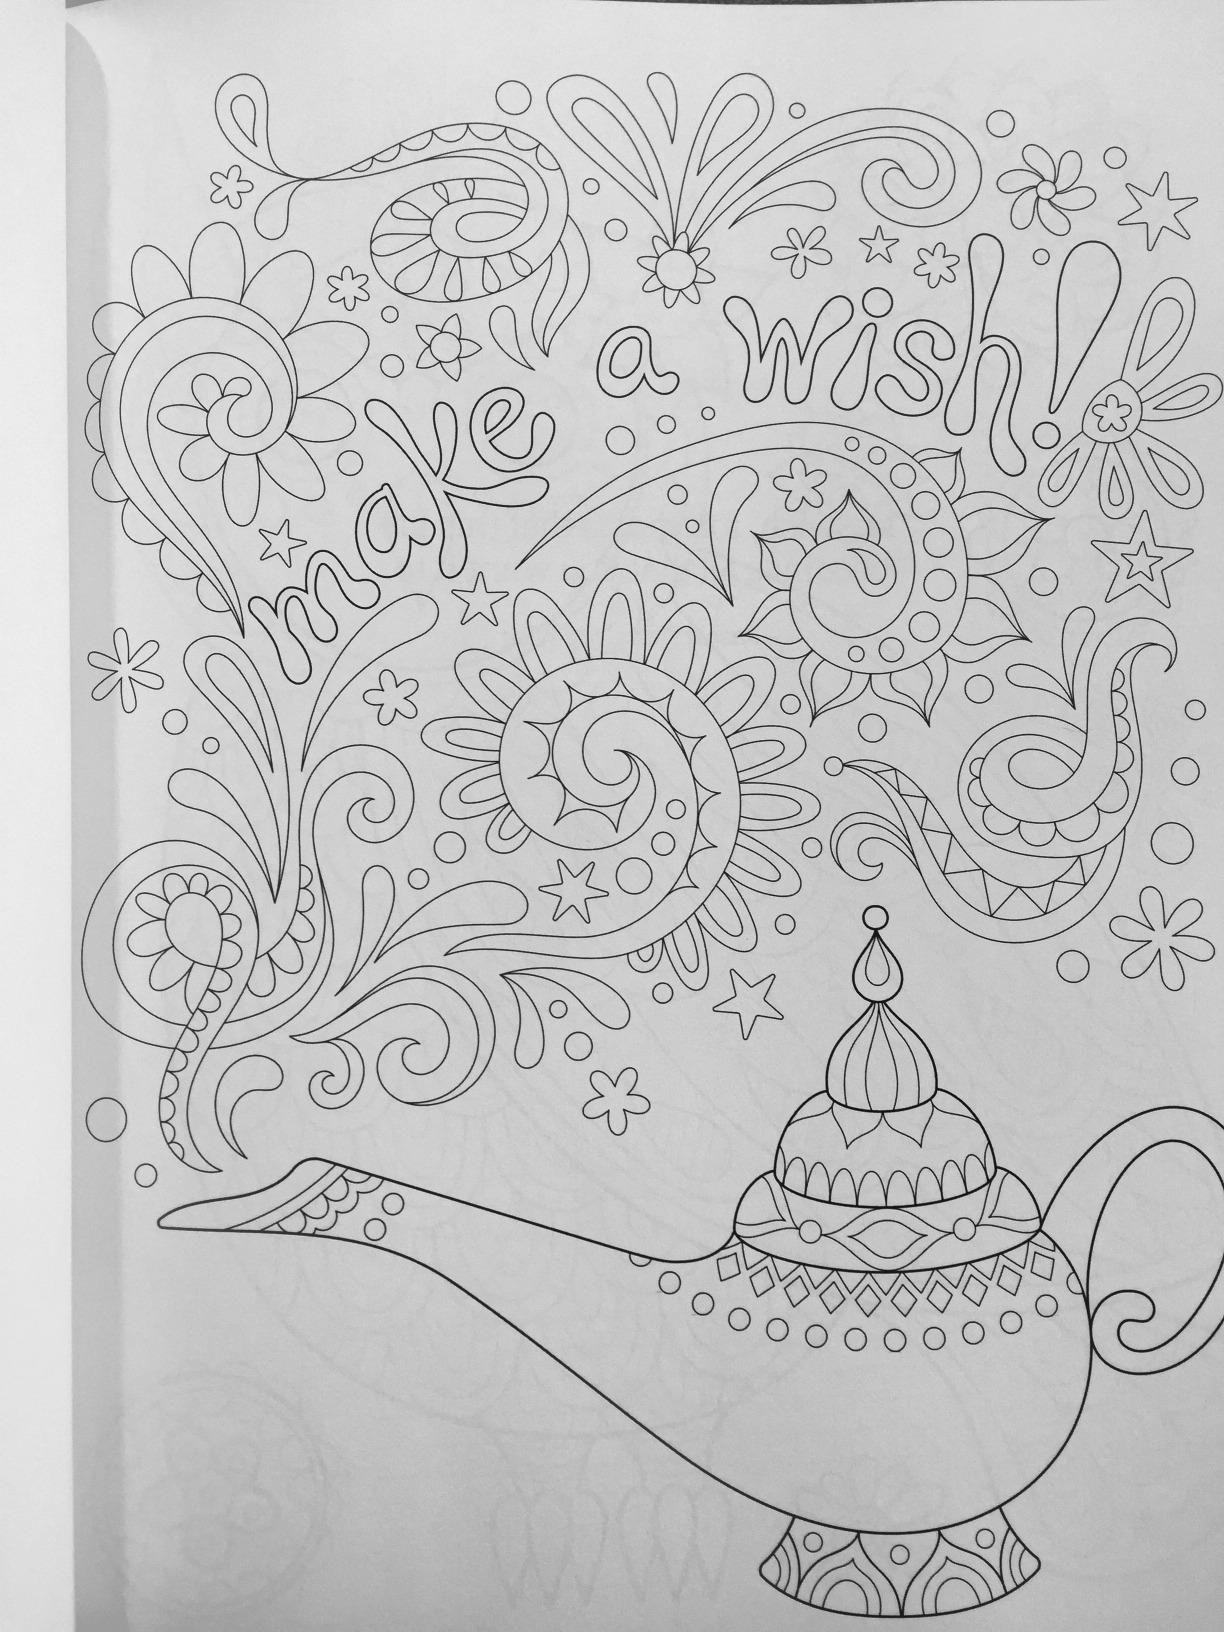 Free spirit coloring book by thaneeya mcardle coloring books by - Free Spirit Coloring Book Coloring Is Fun Thaneeya Mcardle 9781574219975 Amazon